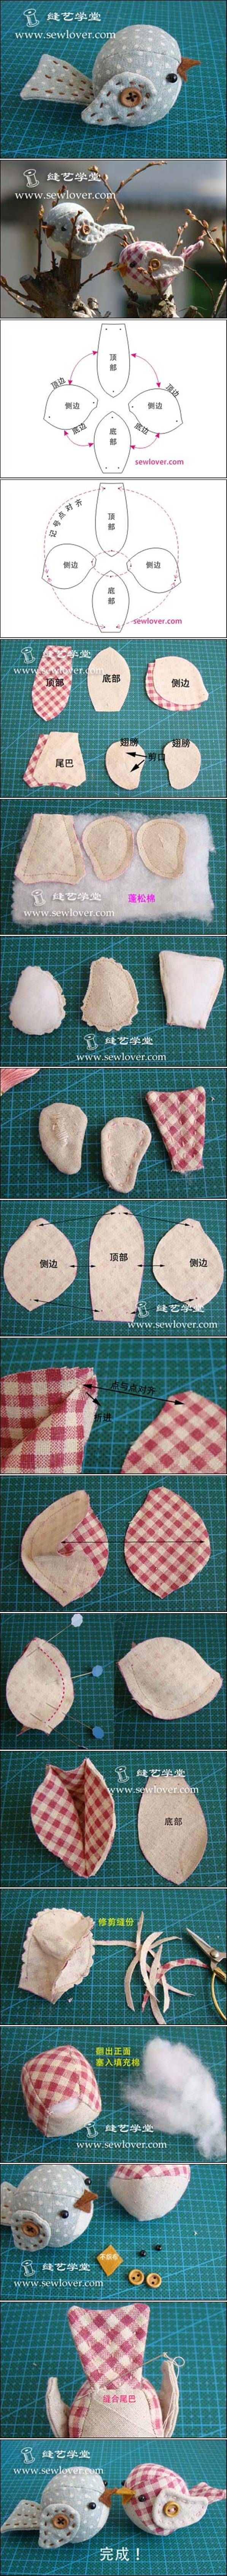 DIY Little Fabric Bird Tutorial